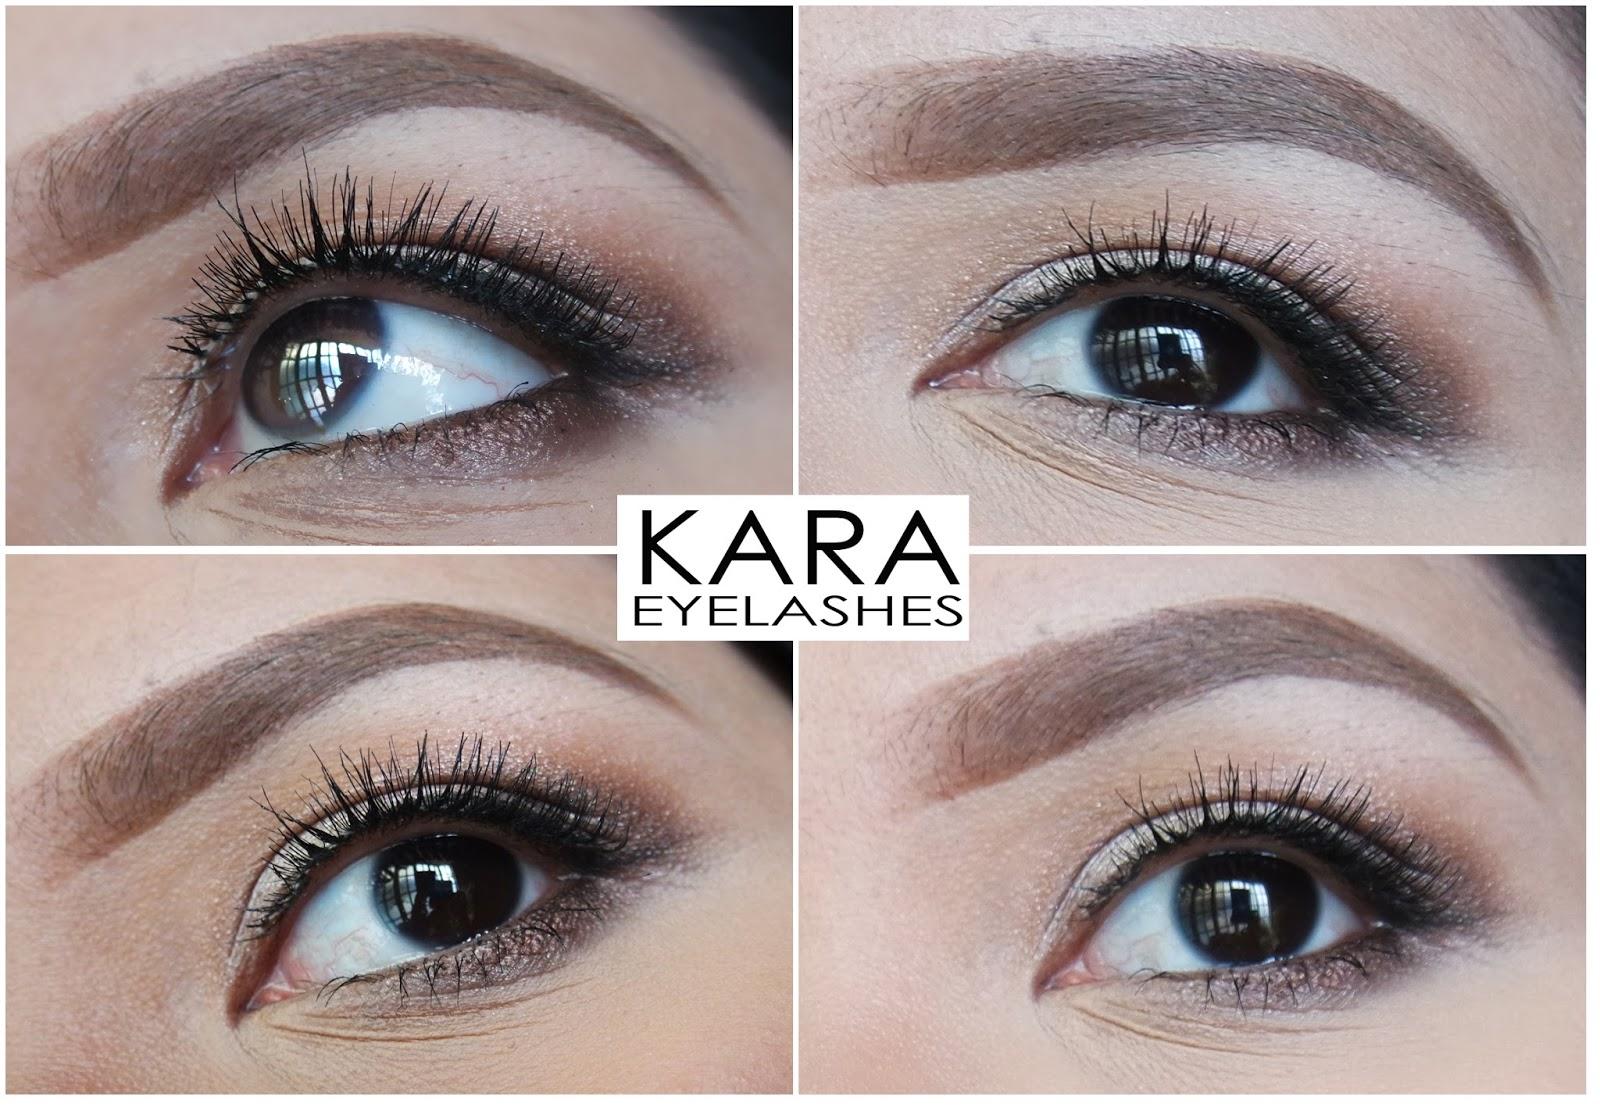 Kikaysimaria Kara Eyelashes